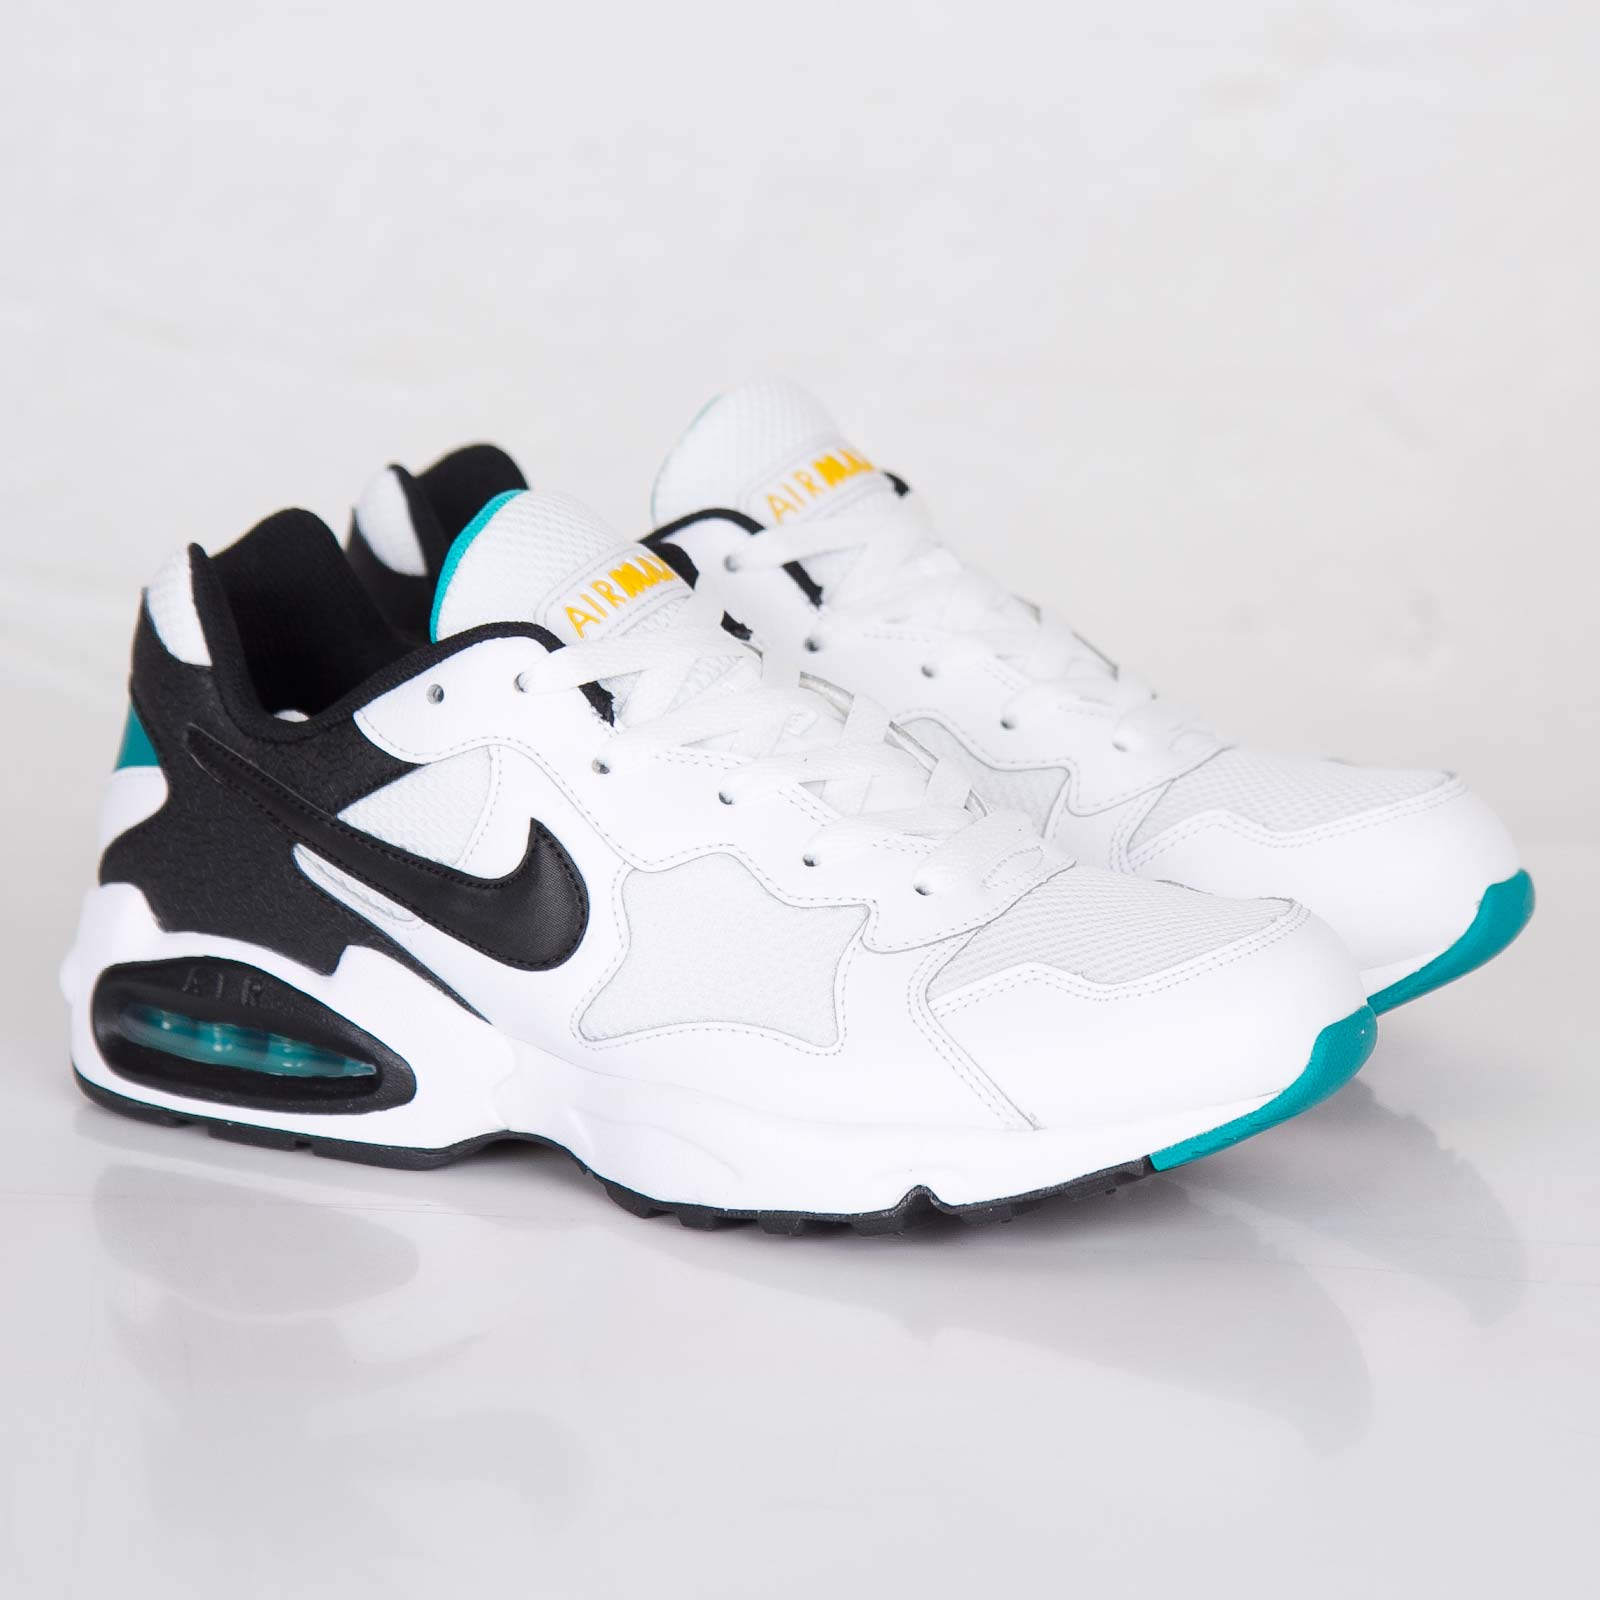 Nike Air Max Triax ´94 - 615767-101 - Sneakersnstuff ...